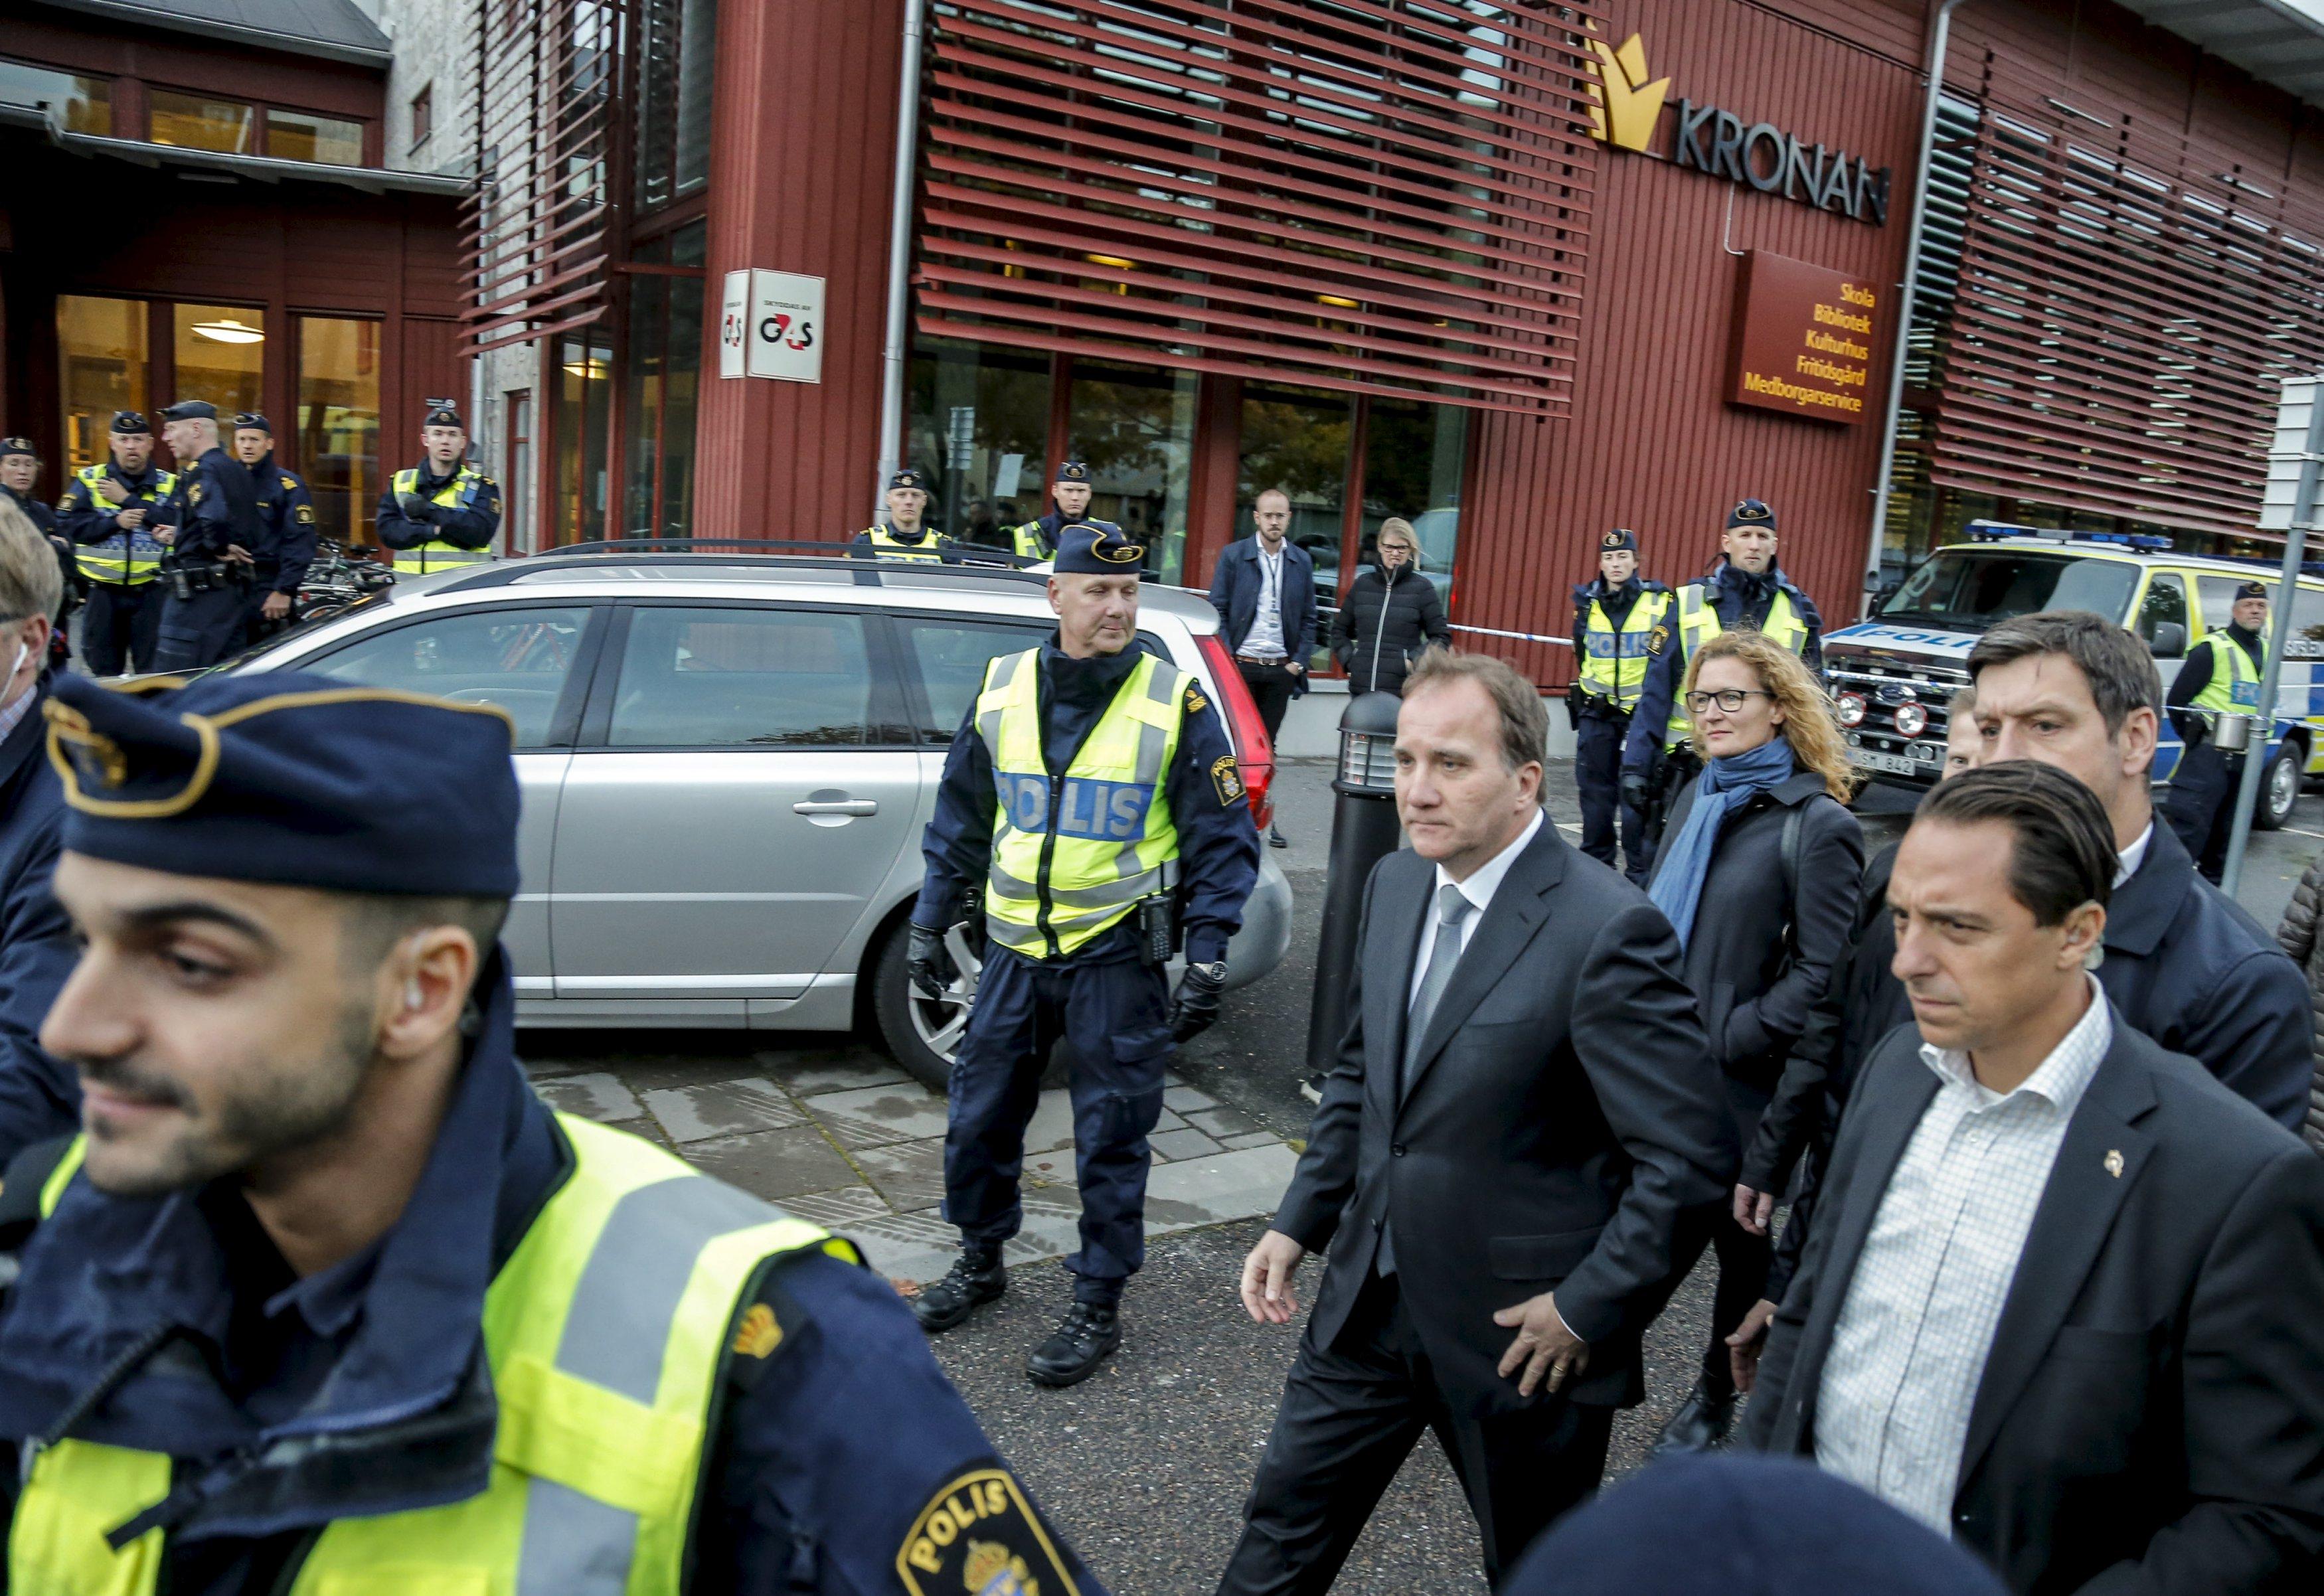 Perdana Menteri Swedia Stefan Lofven (tengah) mengunjungi sekolah Kronan di Trollhattan, Swedia bagian selatan, Kamis (22/10), setelah penyerangan terjadi di sekolah itu. Pria bertopeng membunuh seorang guru dan seorang anak laki-laki dan melukai dua orang lainnya pada hari Kamis, menusuk mereka saat si pelaku berjalan dari kelas ke kelas yang lainnya sebelum ditembak oleh polisi, menurut petugas. ANTARA FOTO/REUTERS/Adam Ihse/TT News Agency.